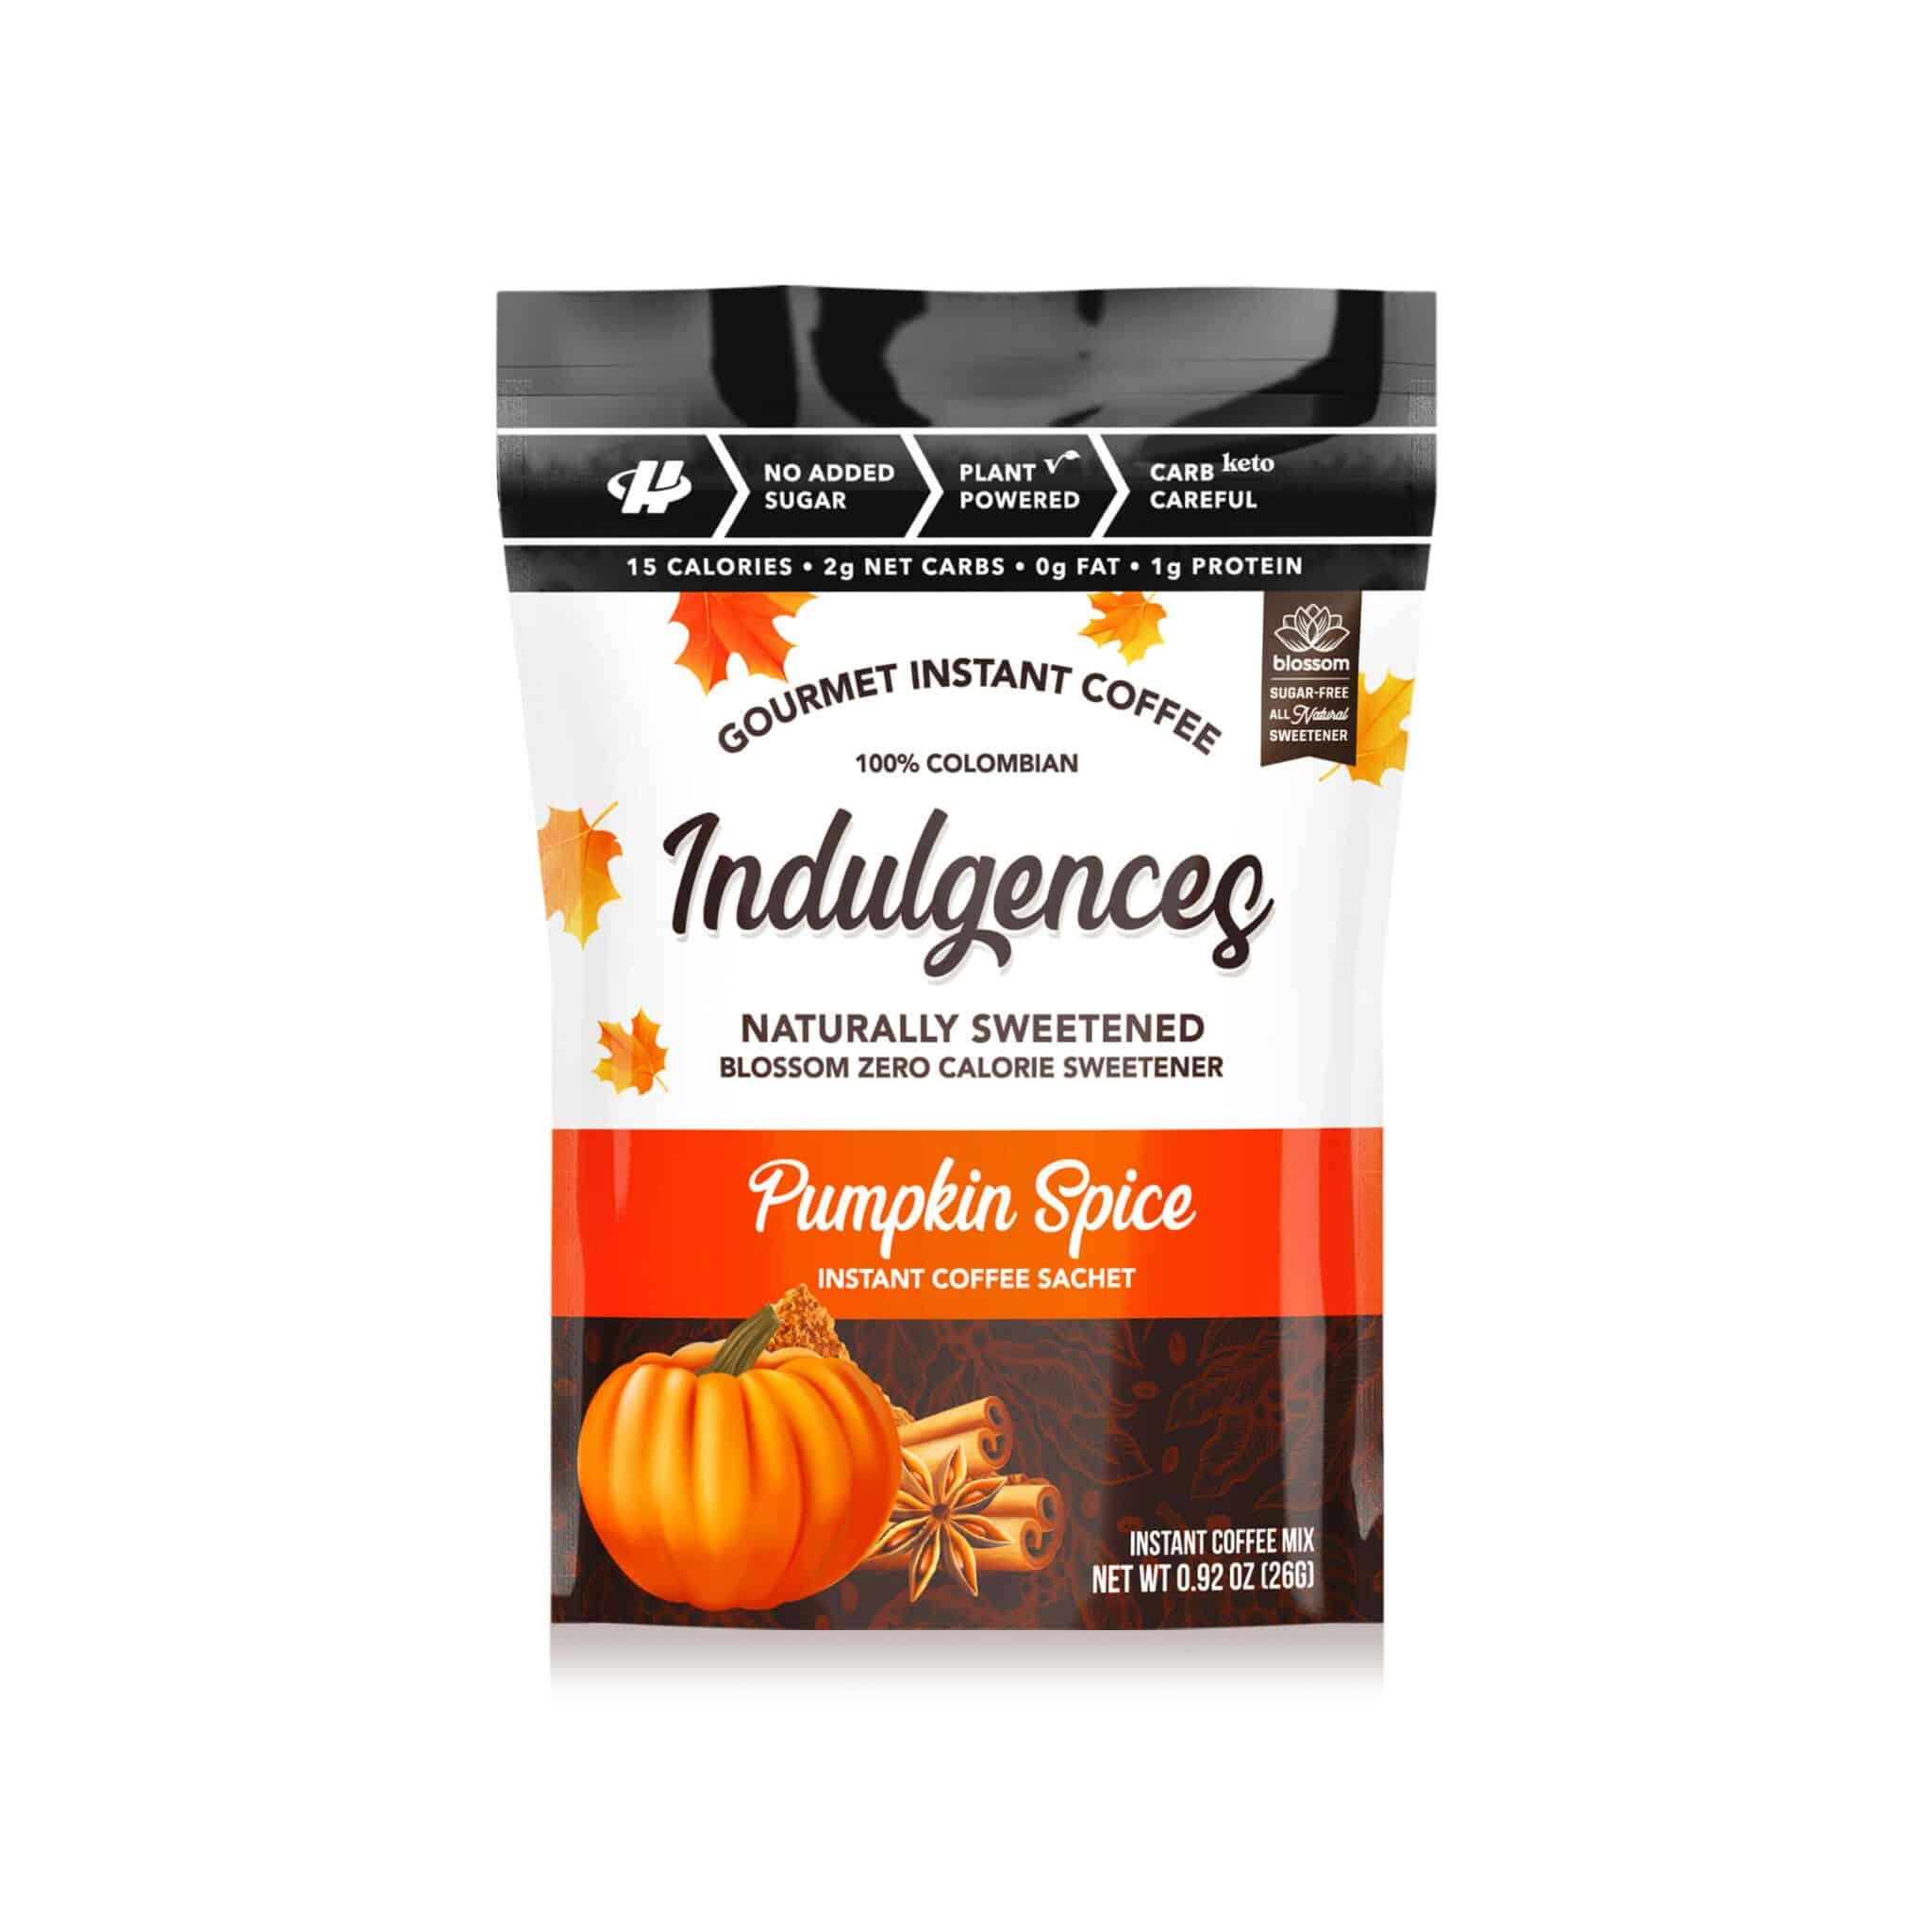 Indulgences-Pumpkin-Spice-Coffee-scaled